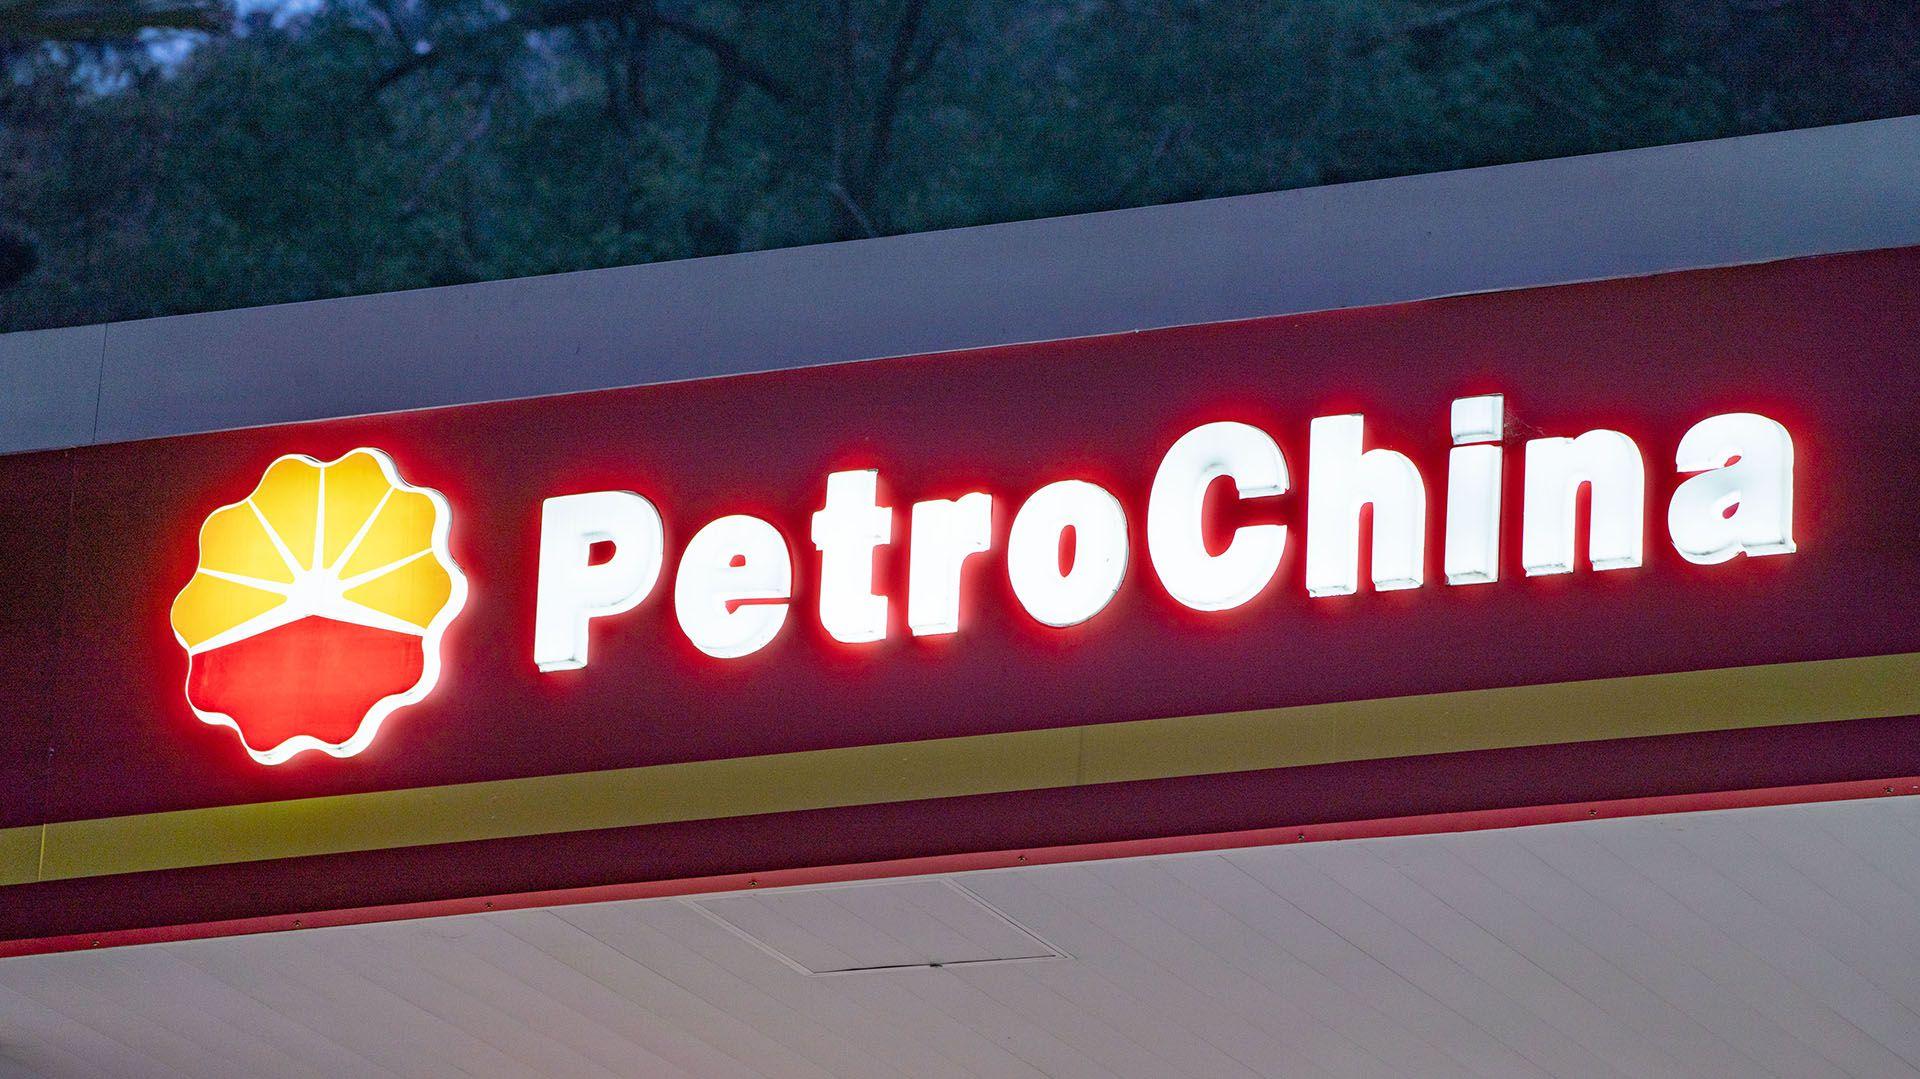 La petrolera estatal china PetroChina, de presencia en América Latina, es una de las interesadas(Anthony Kwan/Bloomberg)